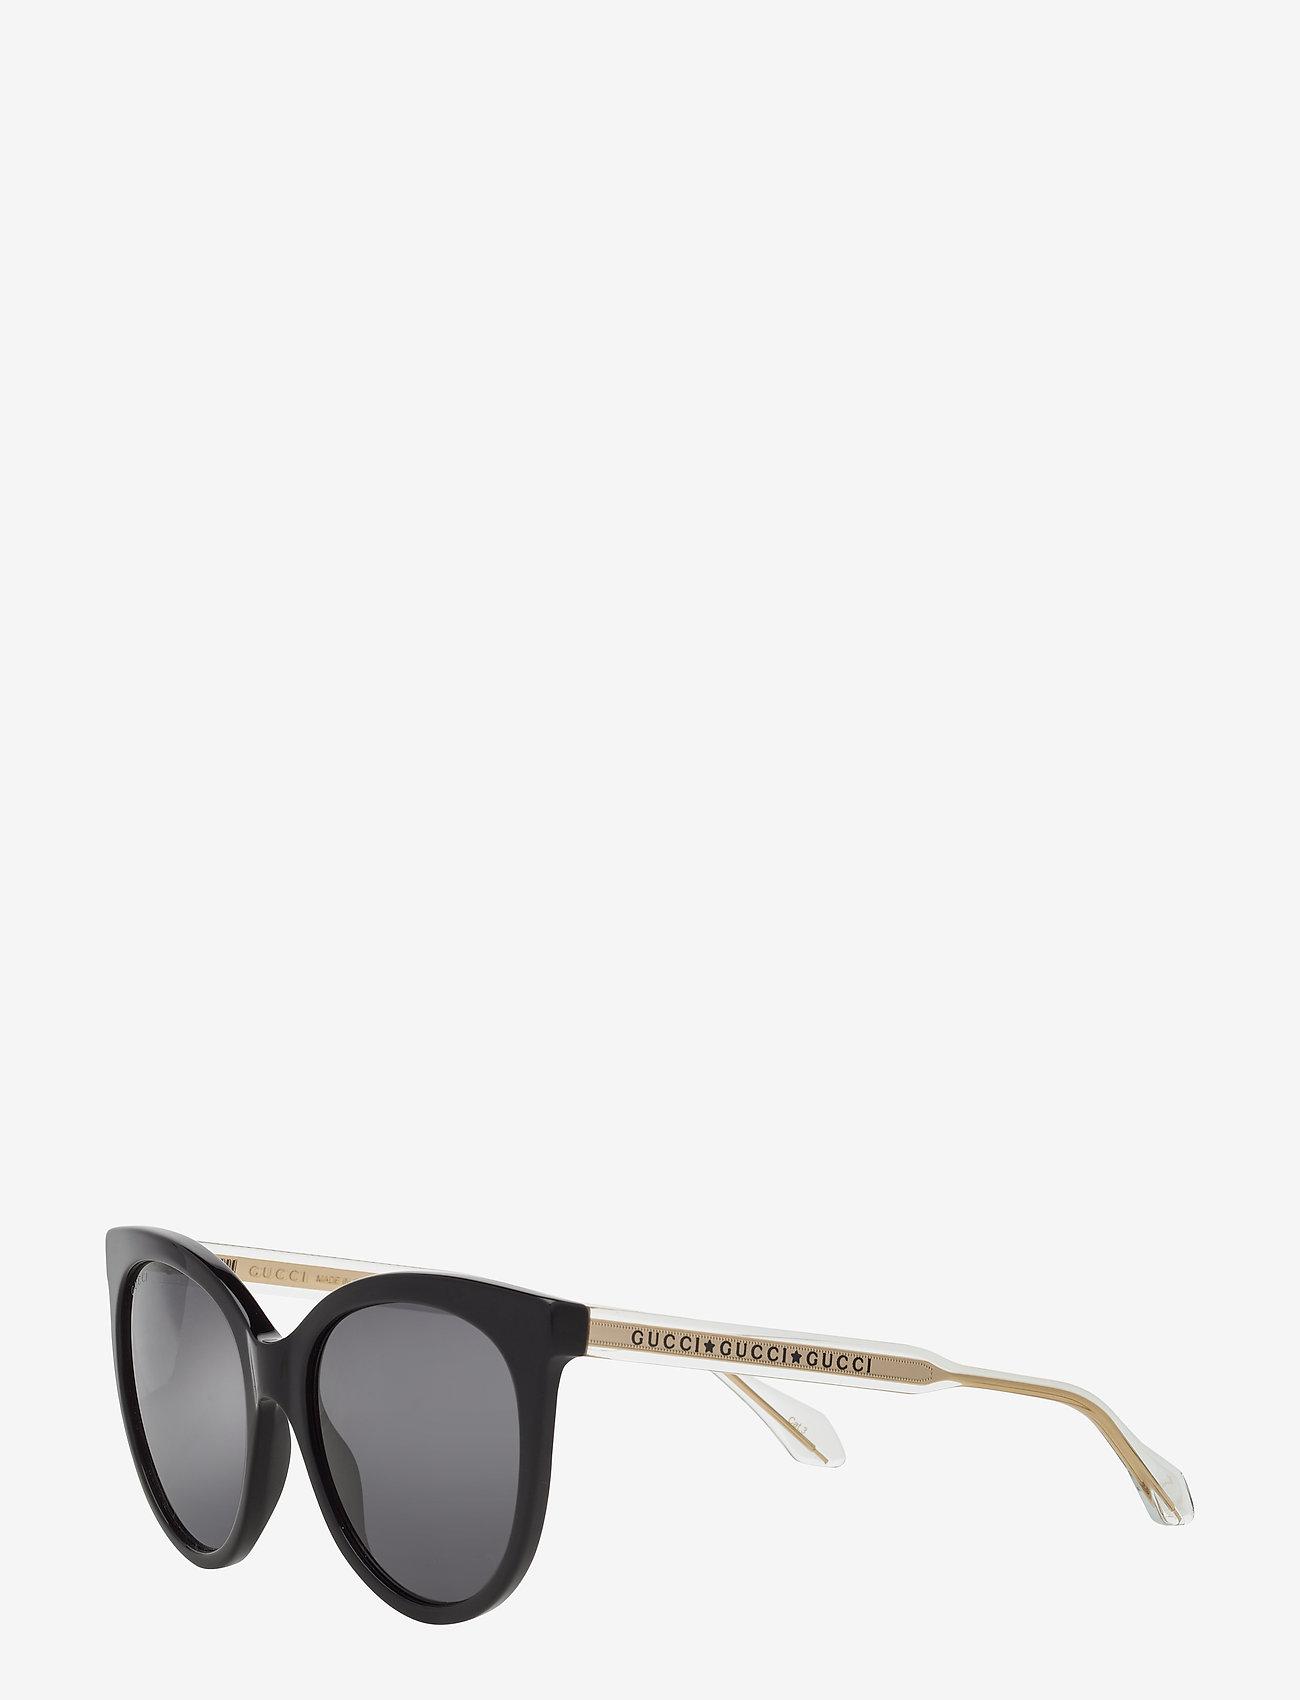 Gucci Sunglasses - GG0565S - cat-eye - black-crystal-grey - 1